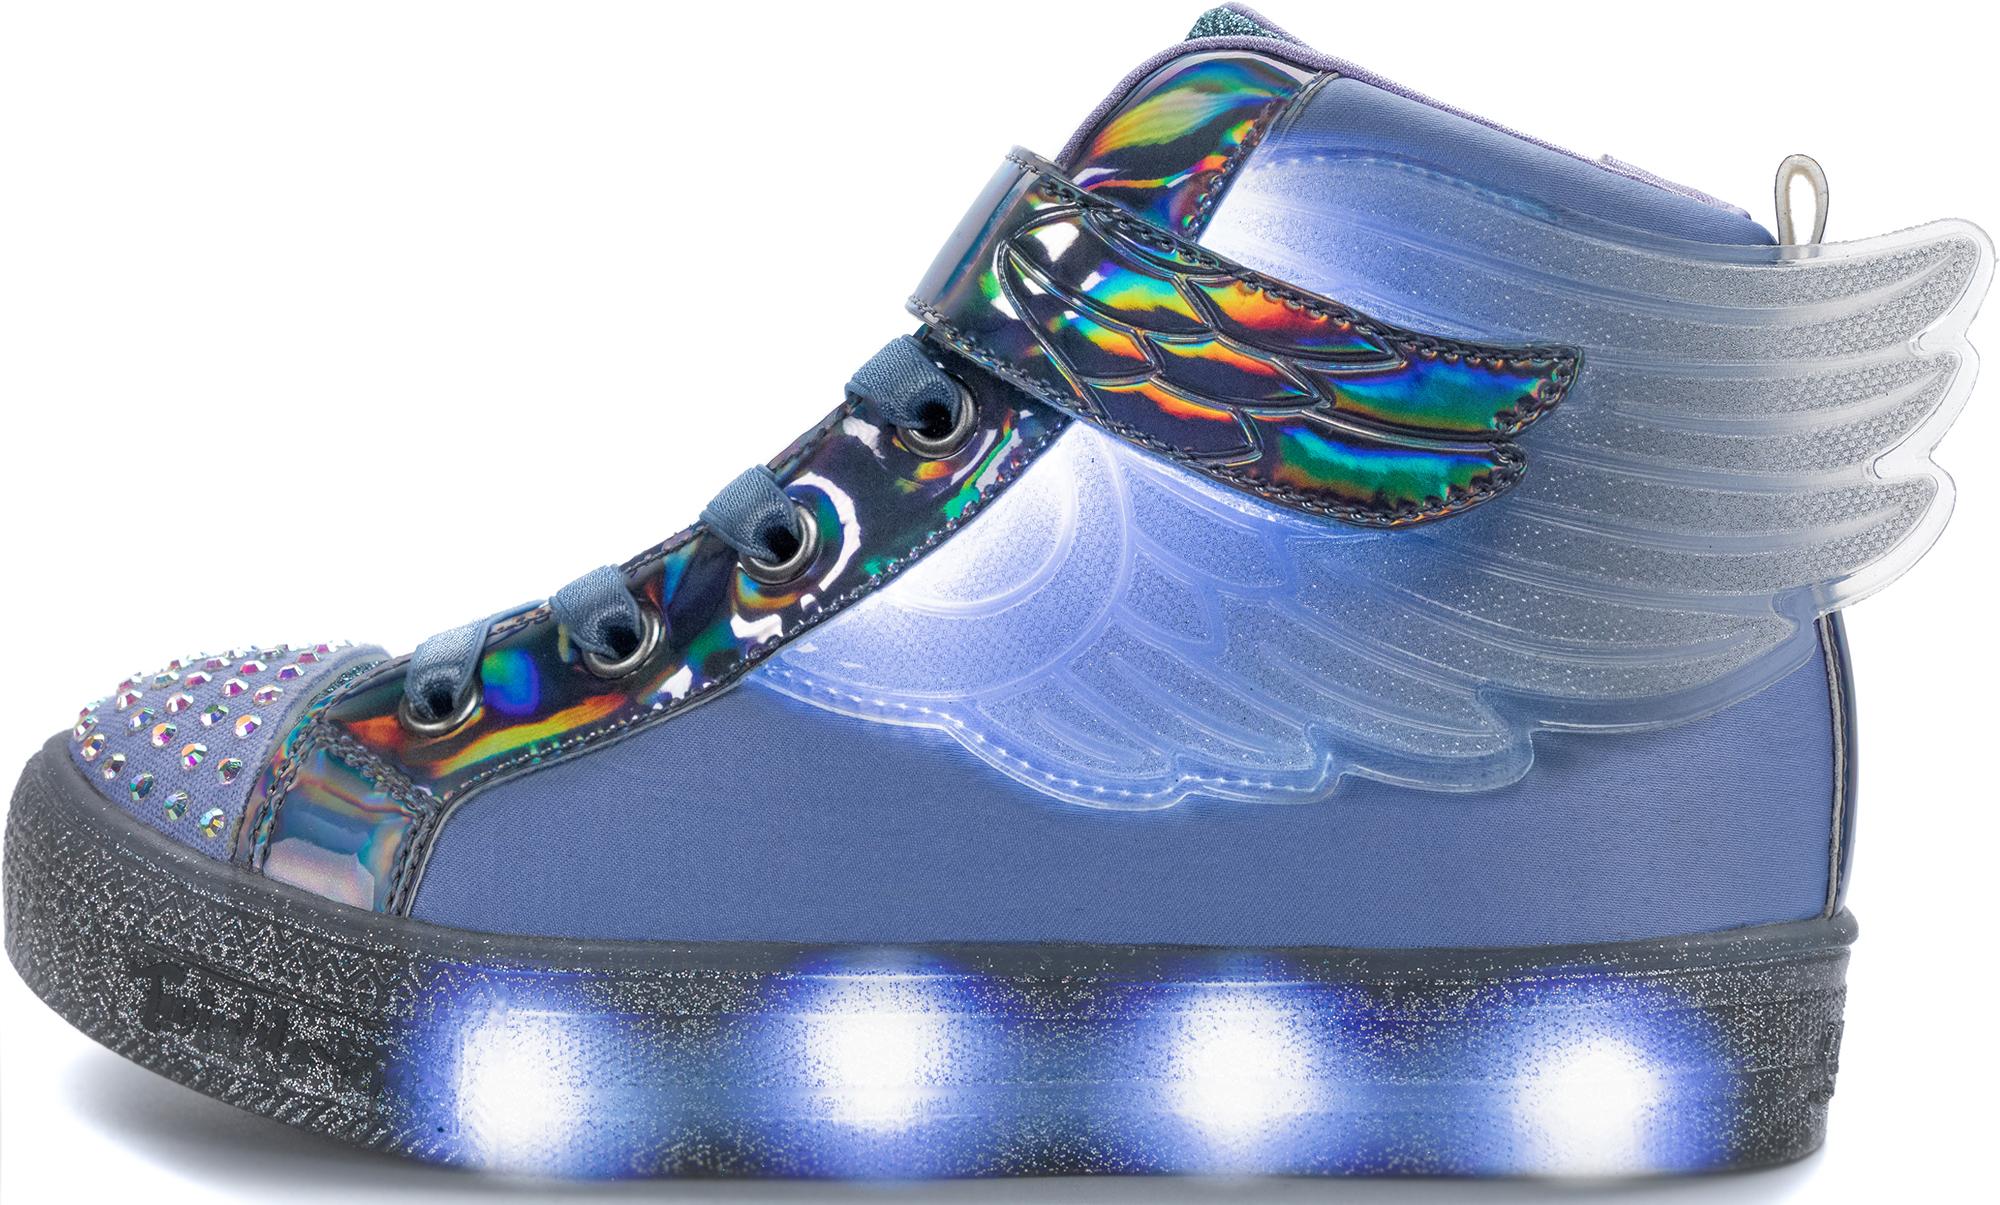 Skechers Кеды для девочек Shuffle Brights-Sparkle Wings, размер 36